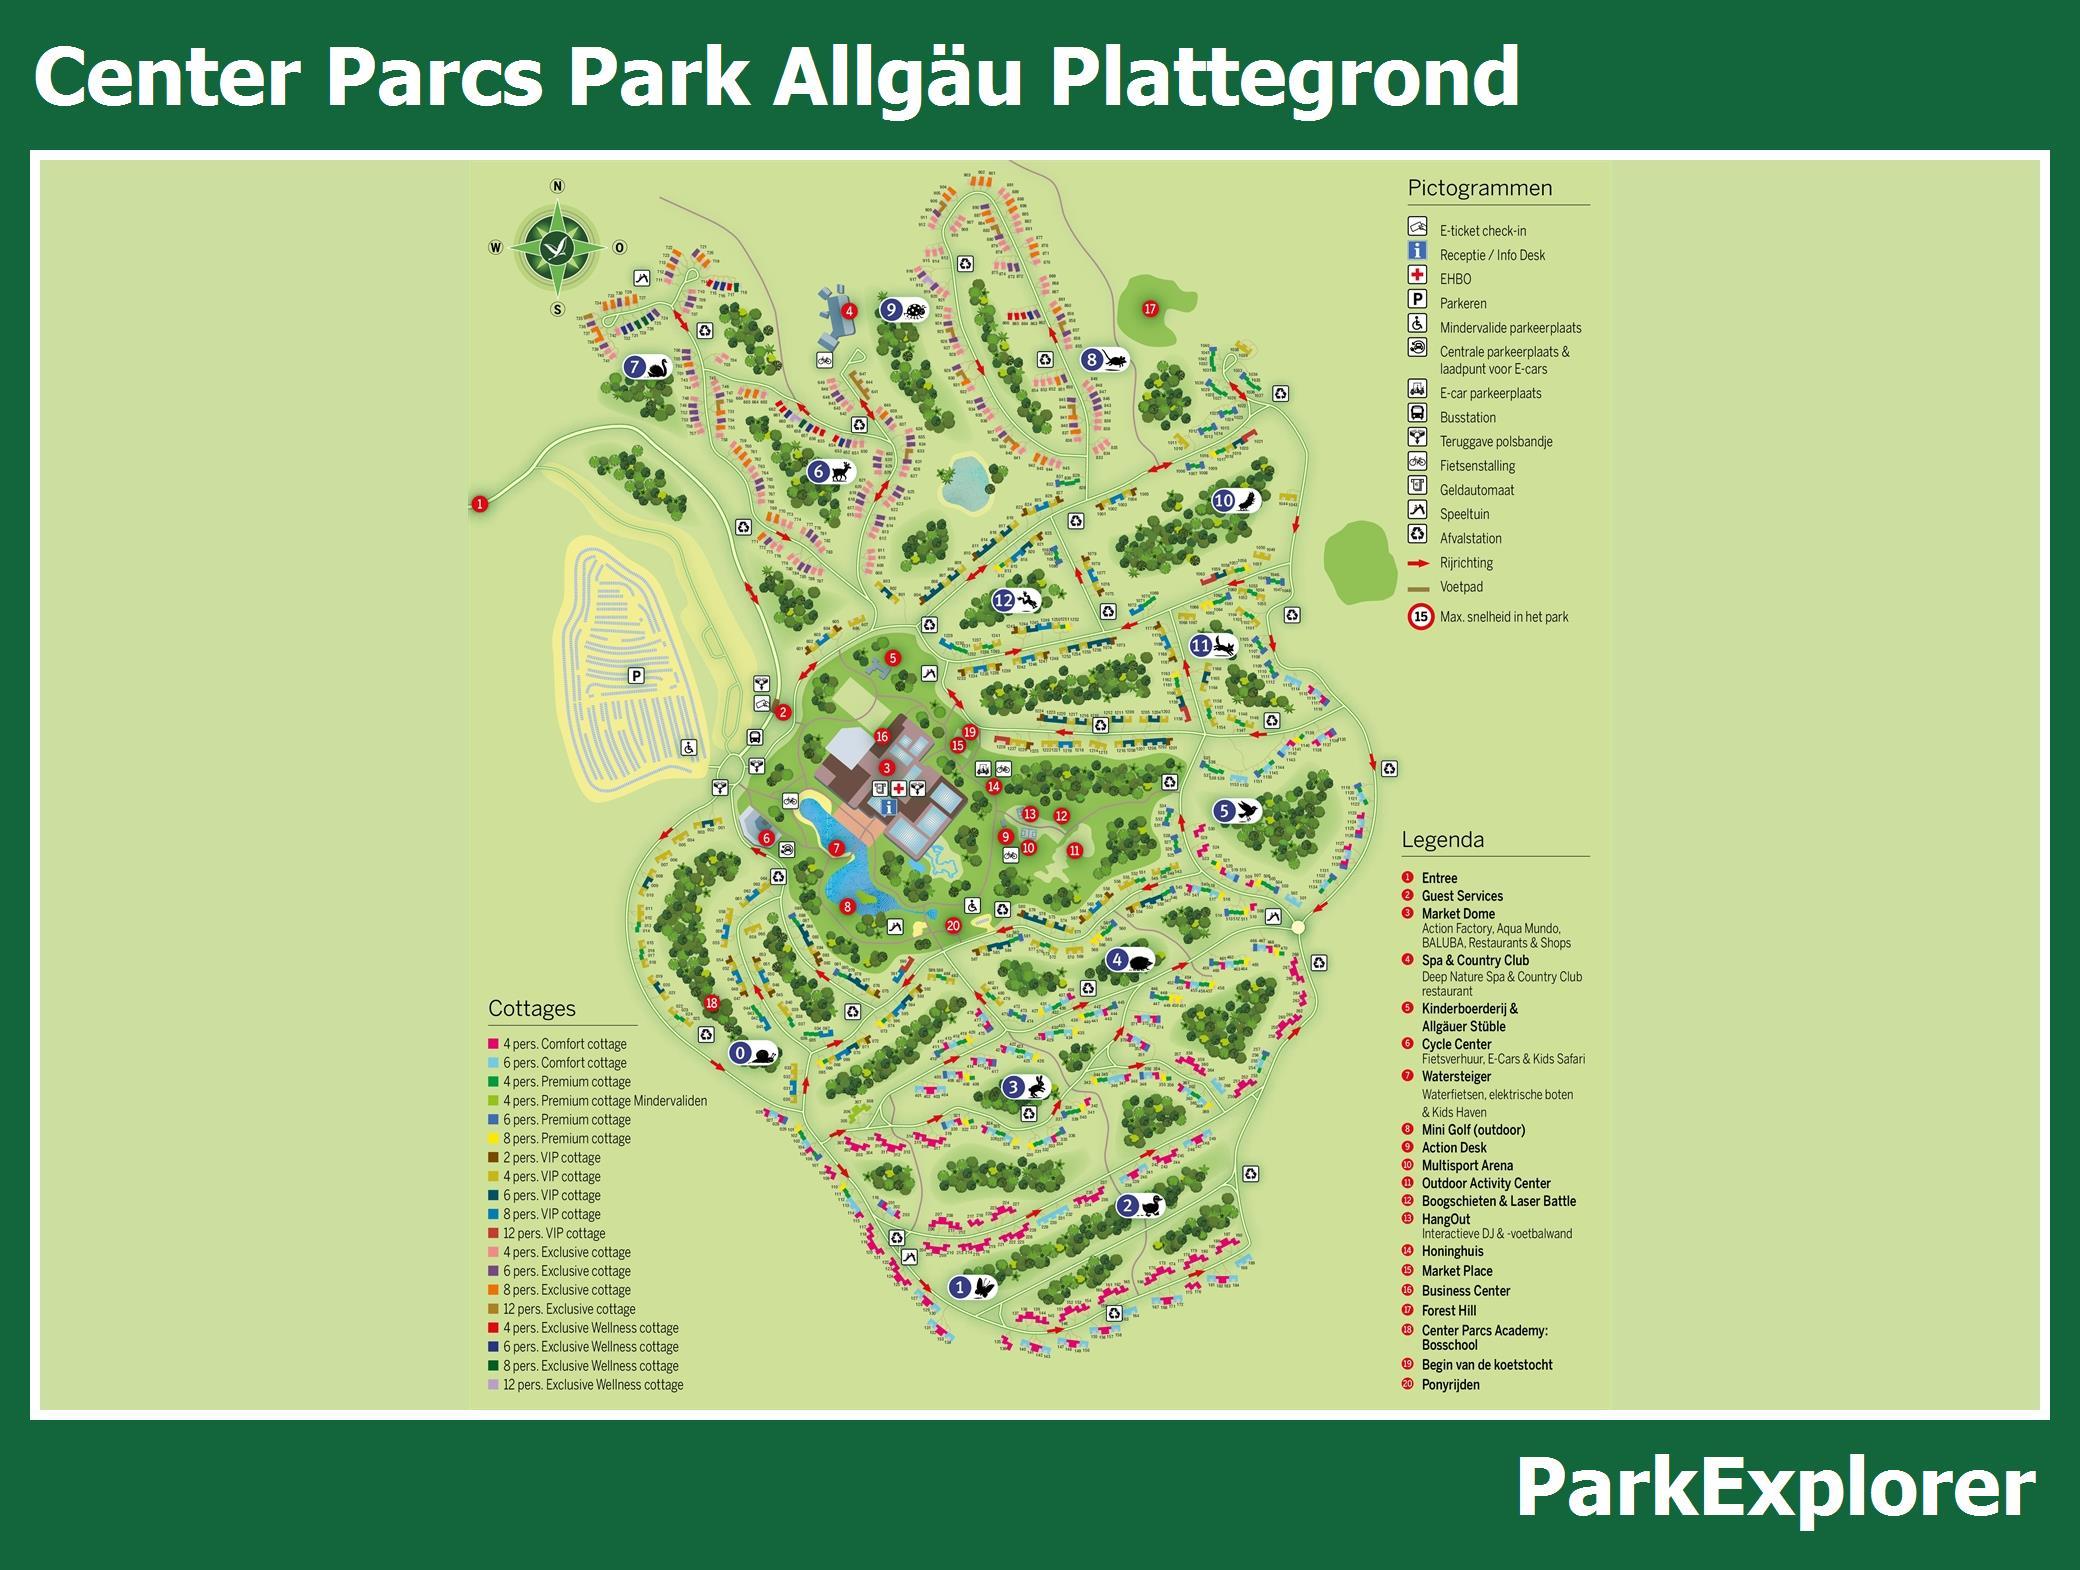 Center Parcs De Eemhof Plattegrond.Parken Centerparcs Kaart Ritchie